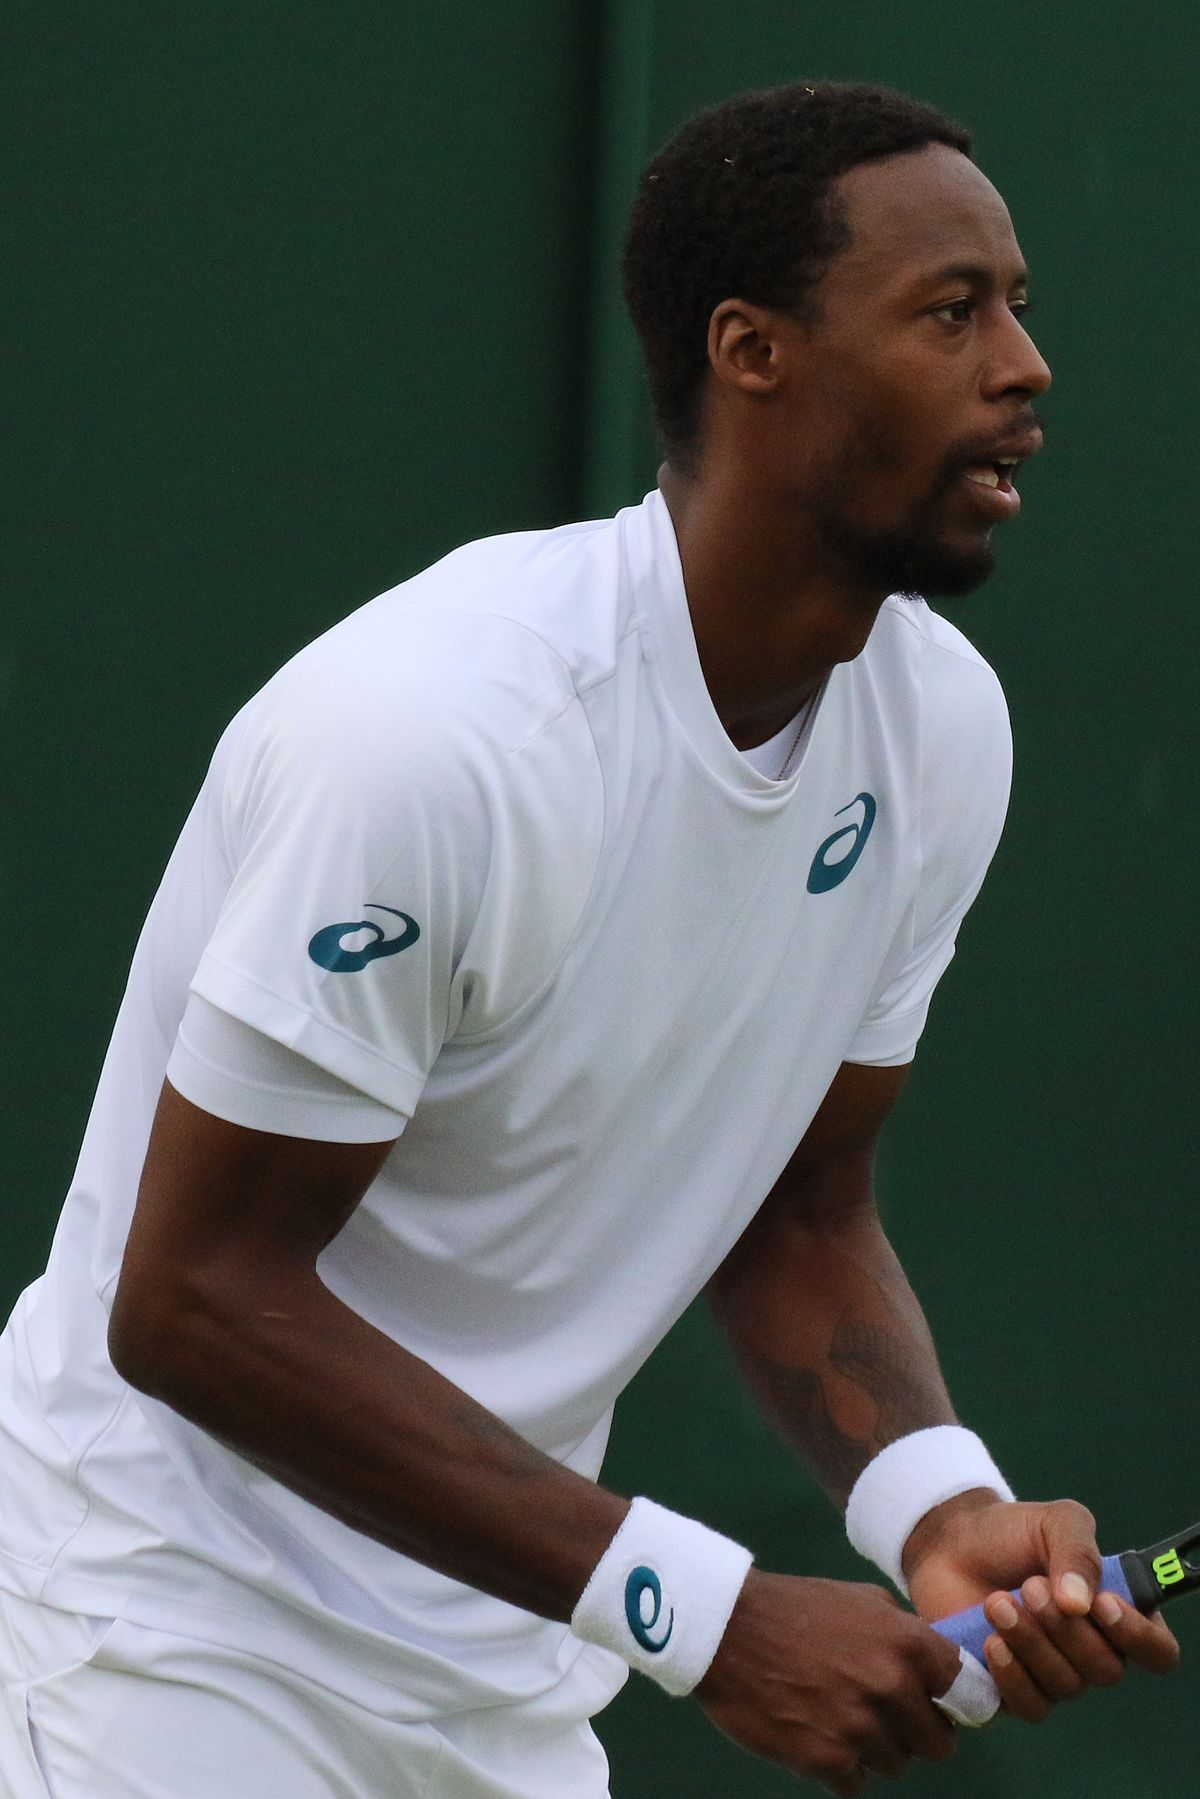 Player Tennis Player